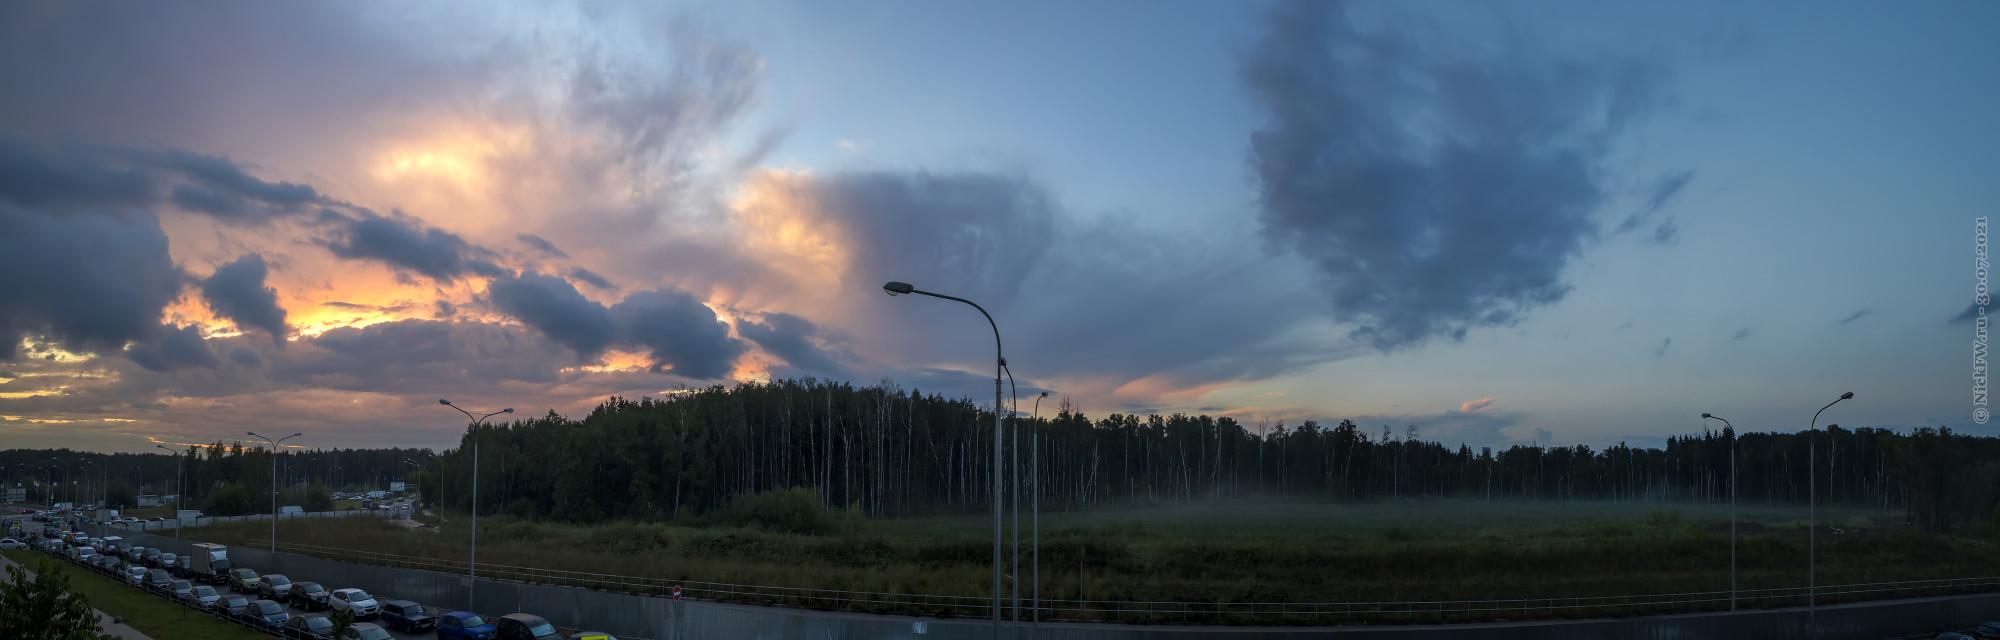 3. Закат и туман в Московском — панорама © NickFW.ru — 30.07.2021г.